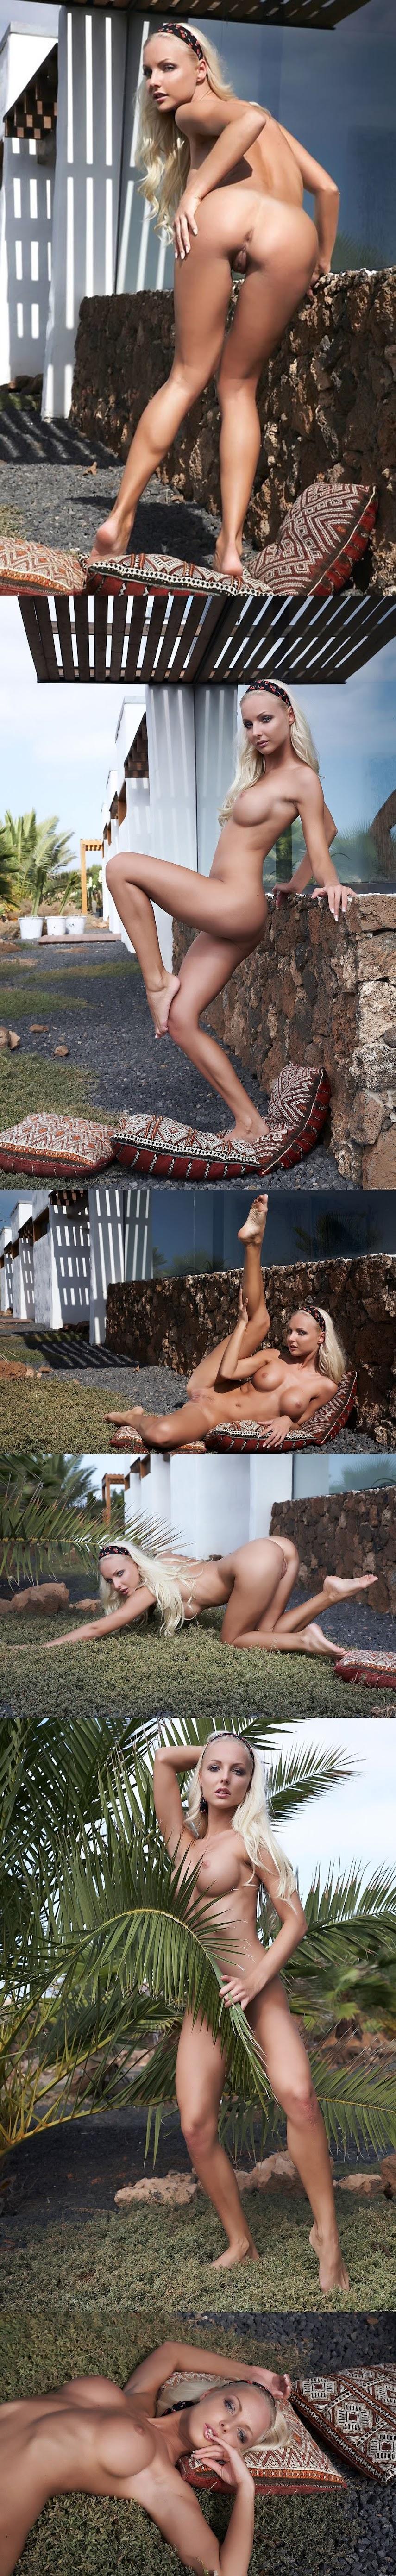 MA_20080825_-_Olga_K__Liza_G_-_Presenting_Liza_-_by_Sergey_Goncharov.zip-jk- Met-Art MA 20080825 - Victoria B - Ibiza Nuda - by Erro